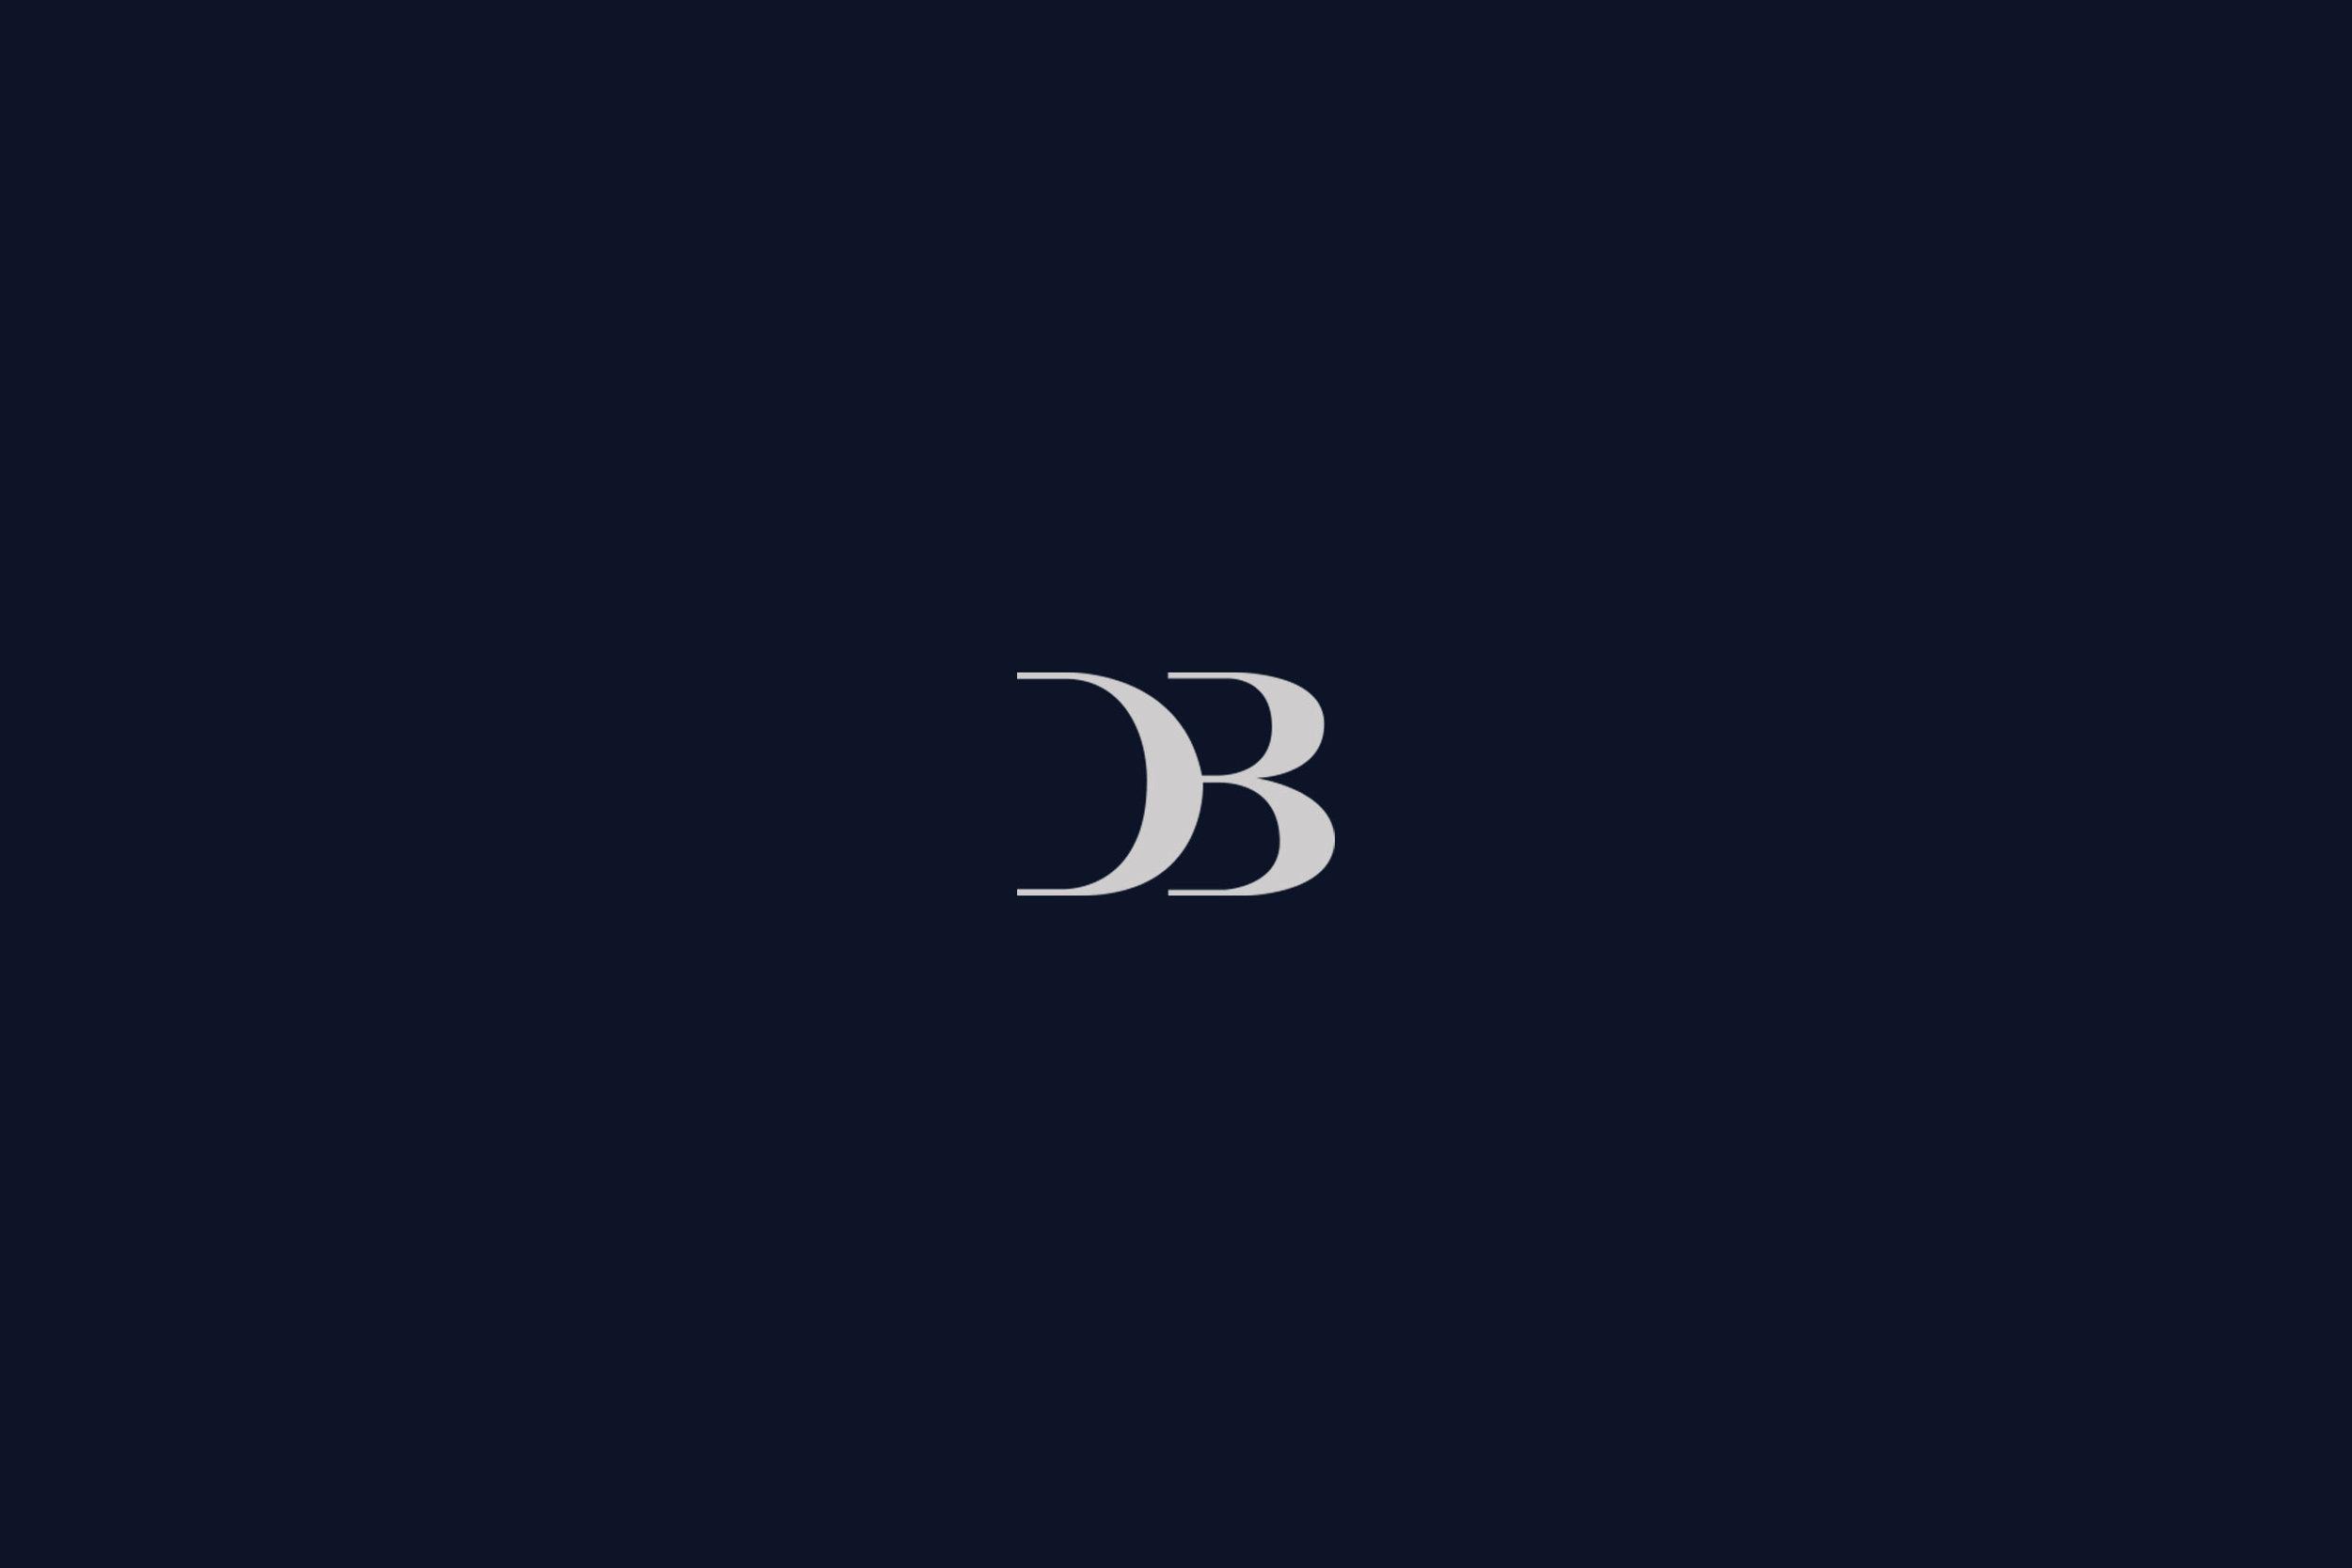 DB-Construction-Canvas-1.jpg